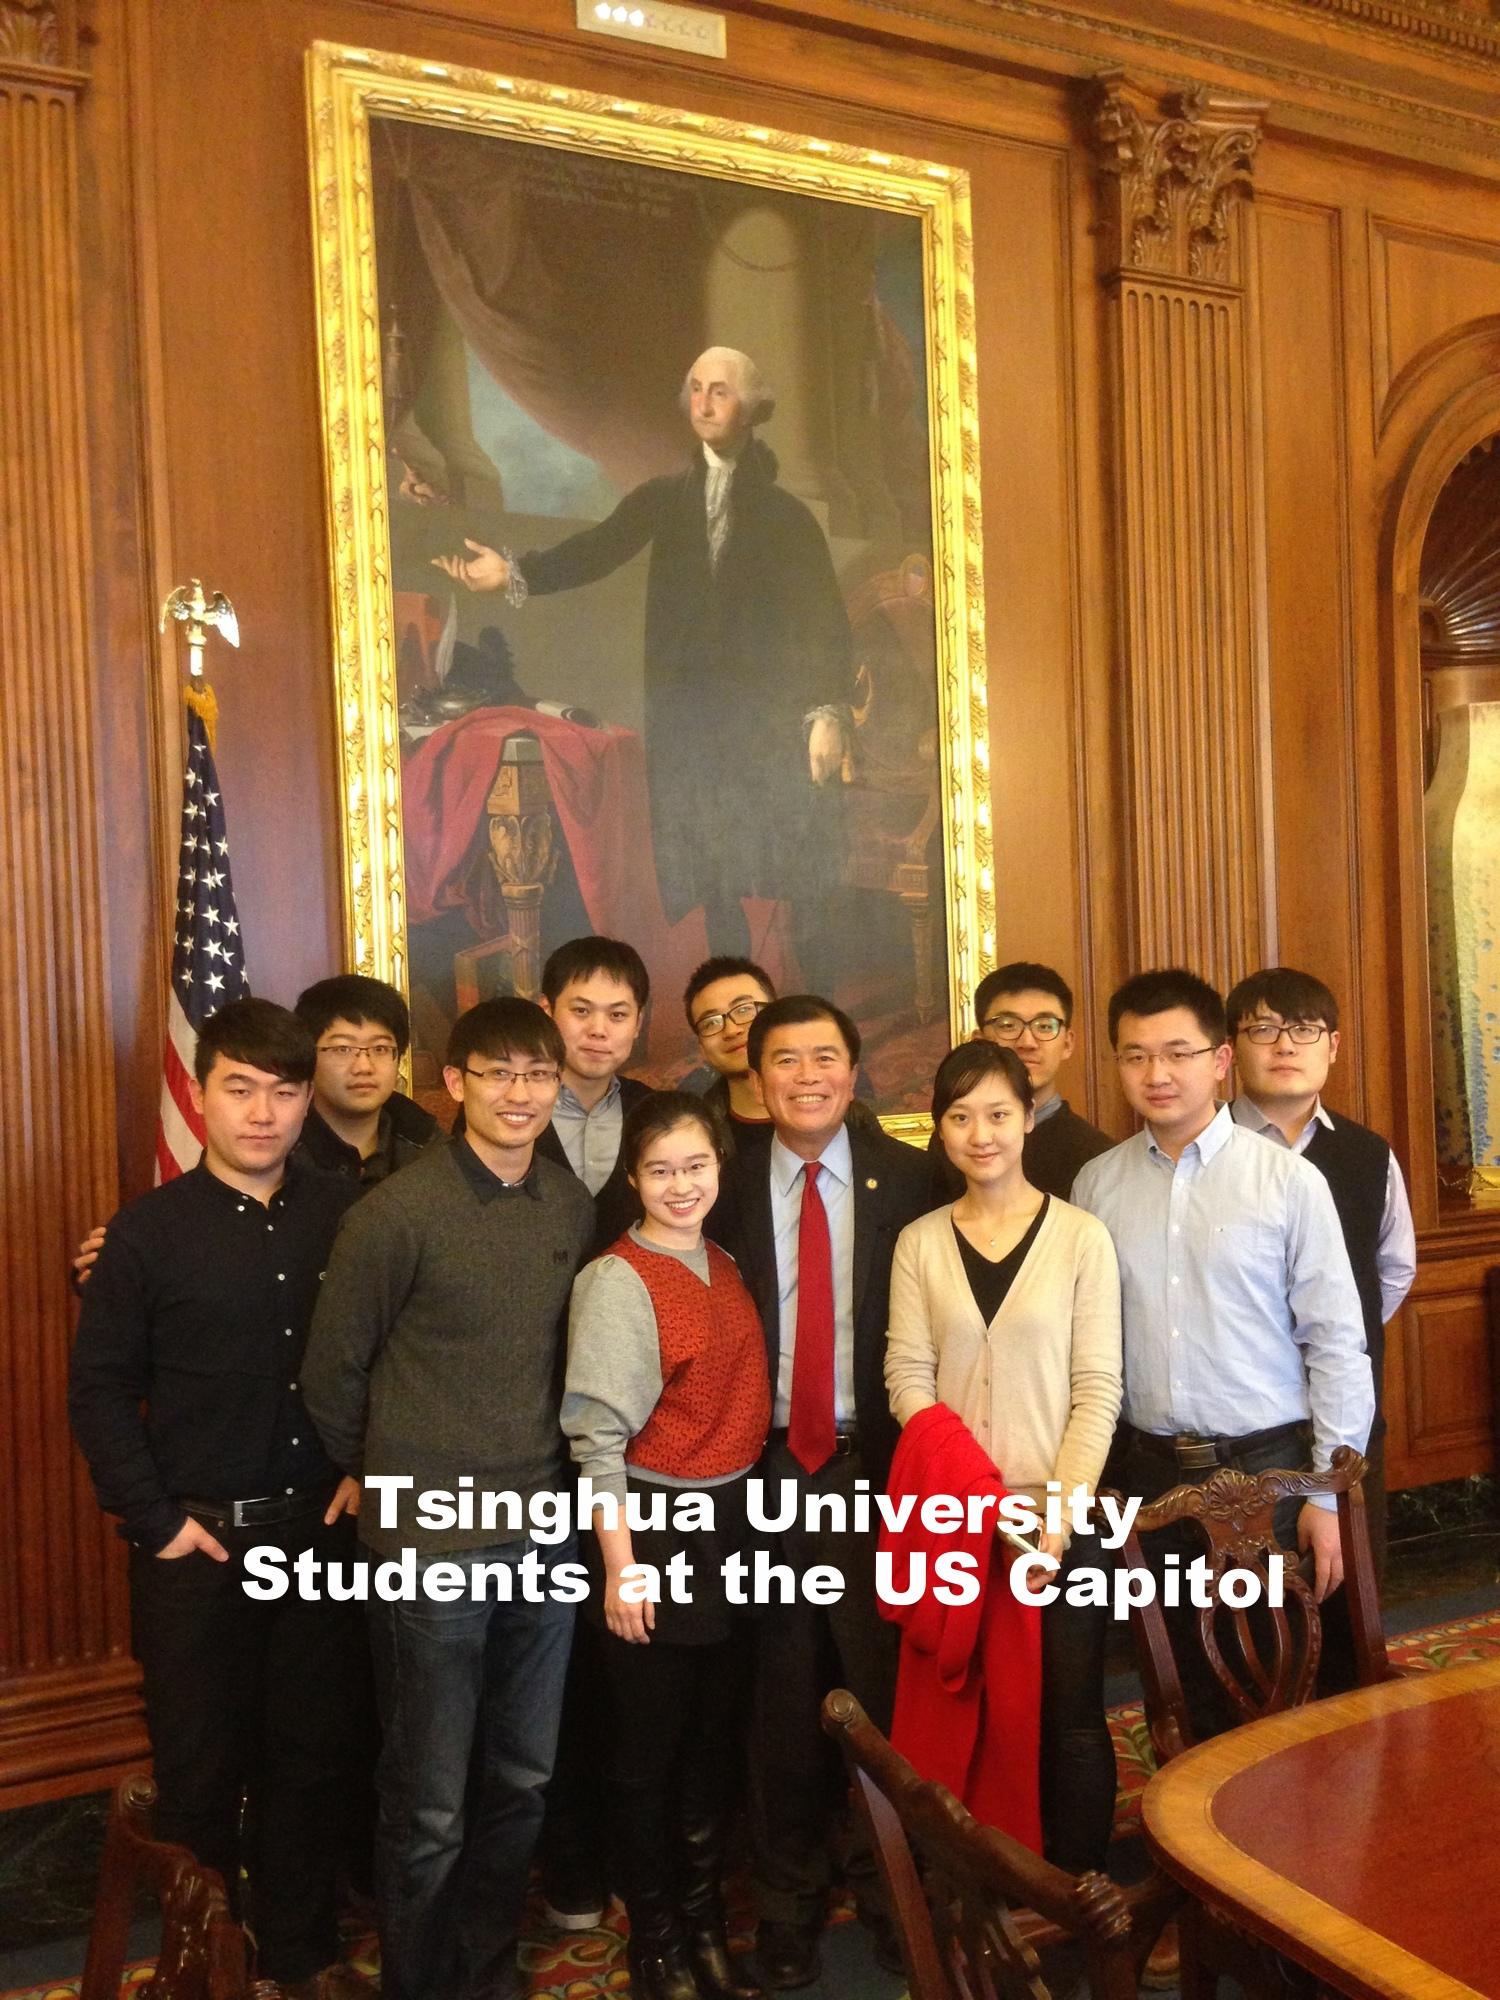 David Wu with Tsinghua University students at the US Capitol